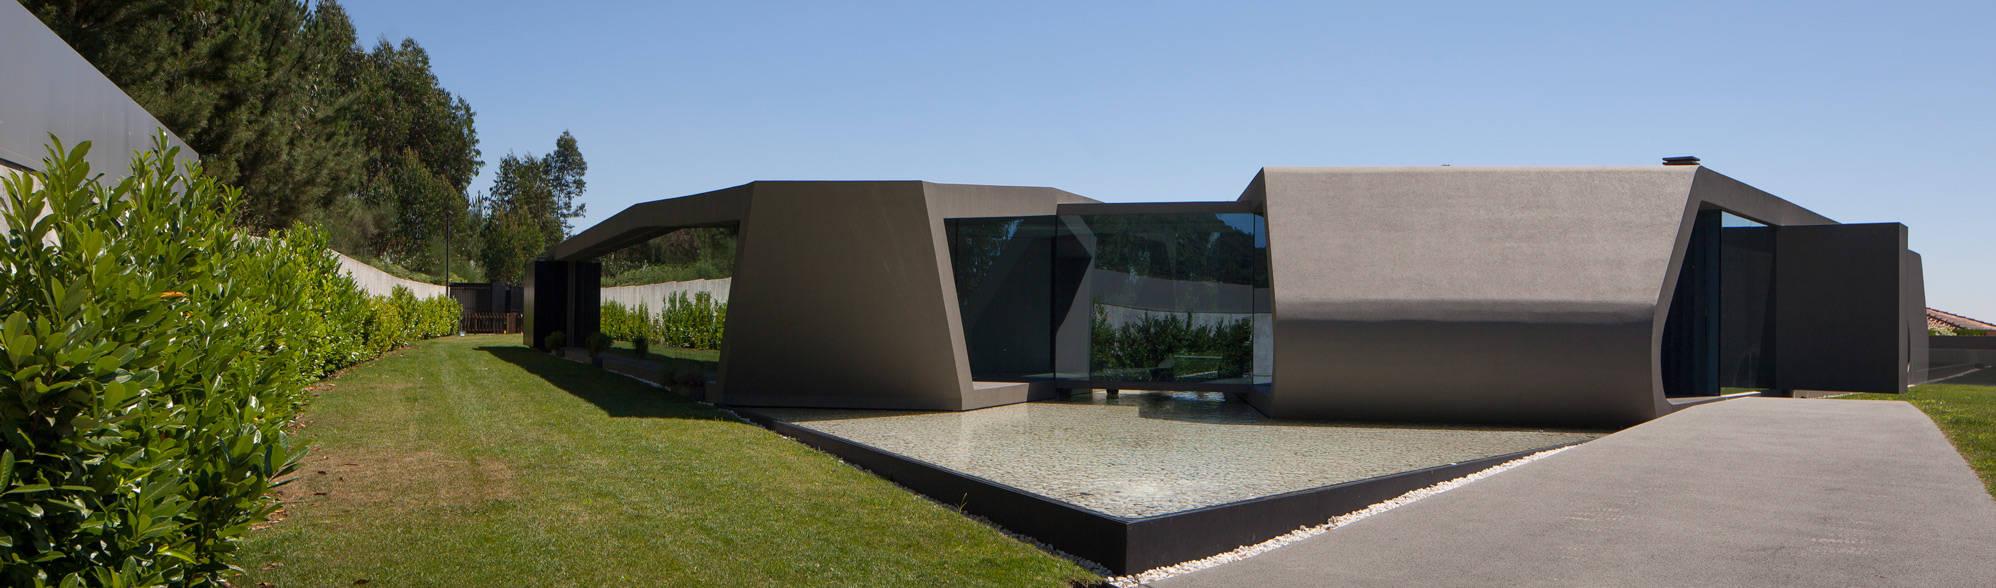 Helder Coelho – Arquitecto, Lda